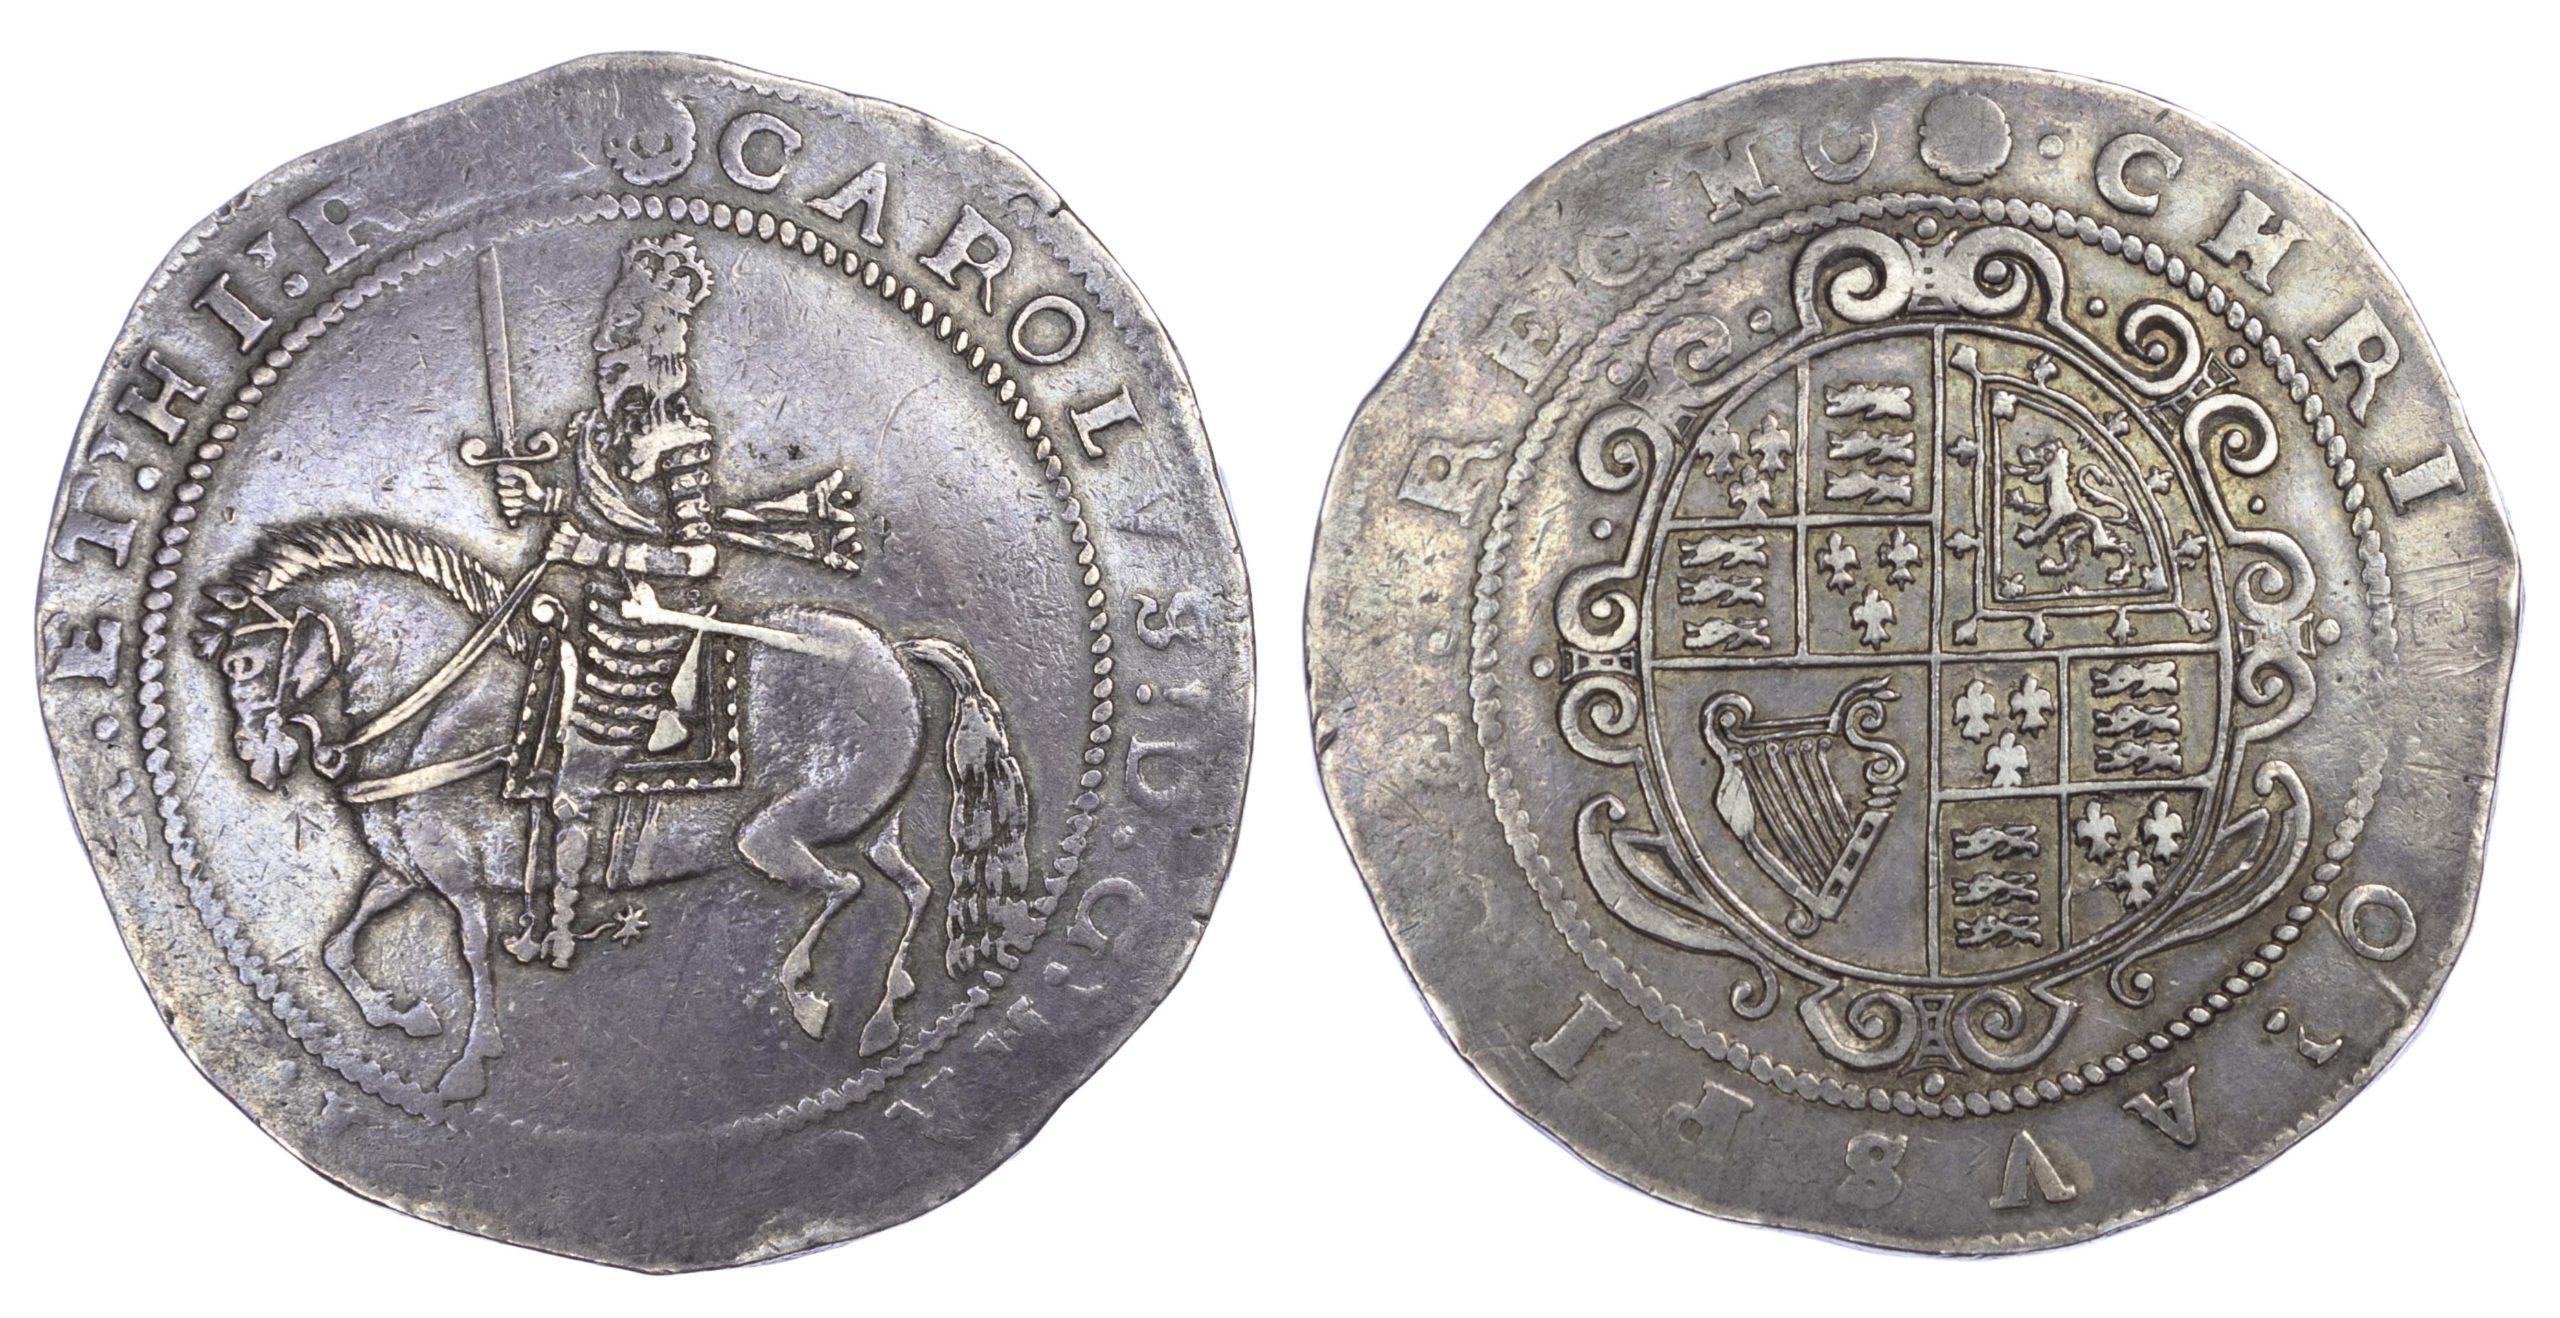 Charles I (1625-49), Crown. Truro mint. Rose i.m. 1642-1643